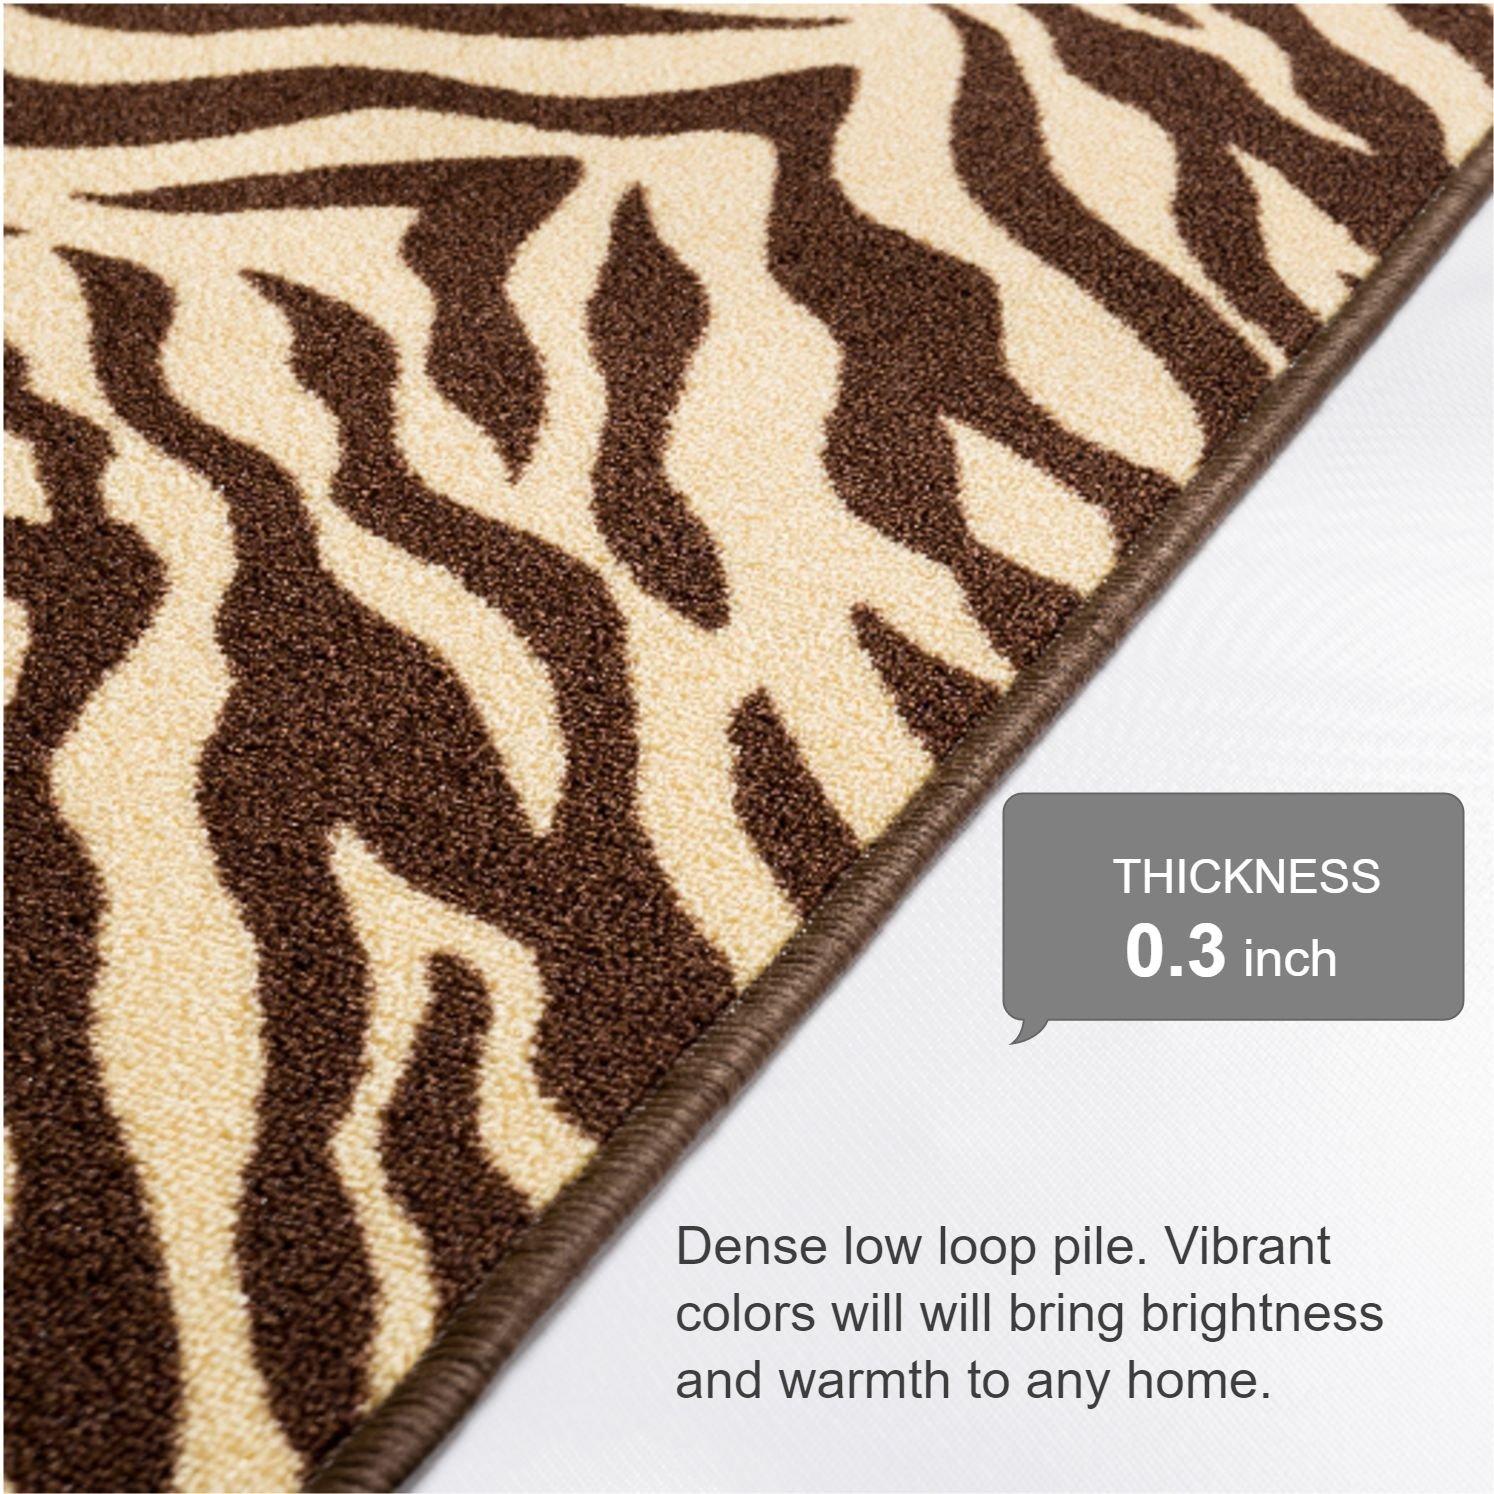 Amazon.com: Yla cebra café Beige diseño de estampado animal ...